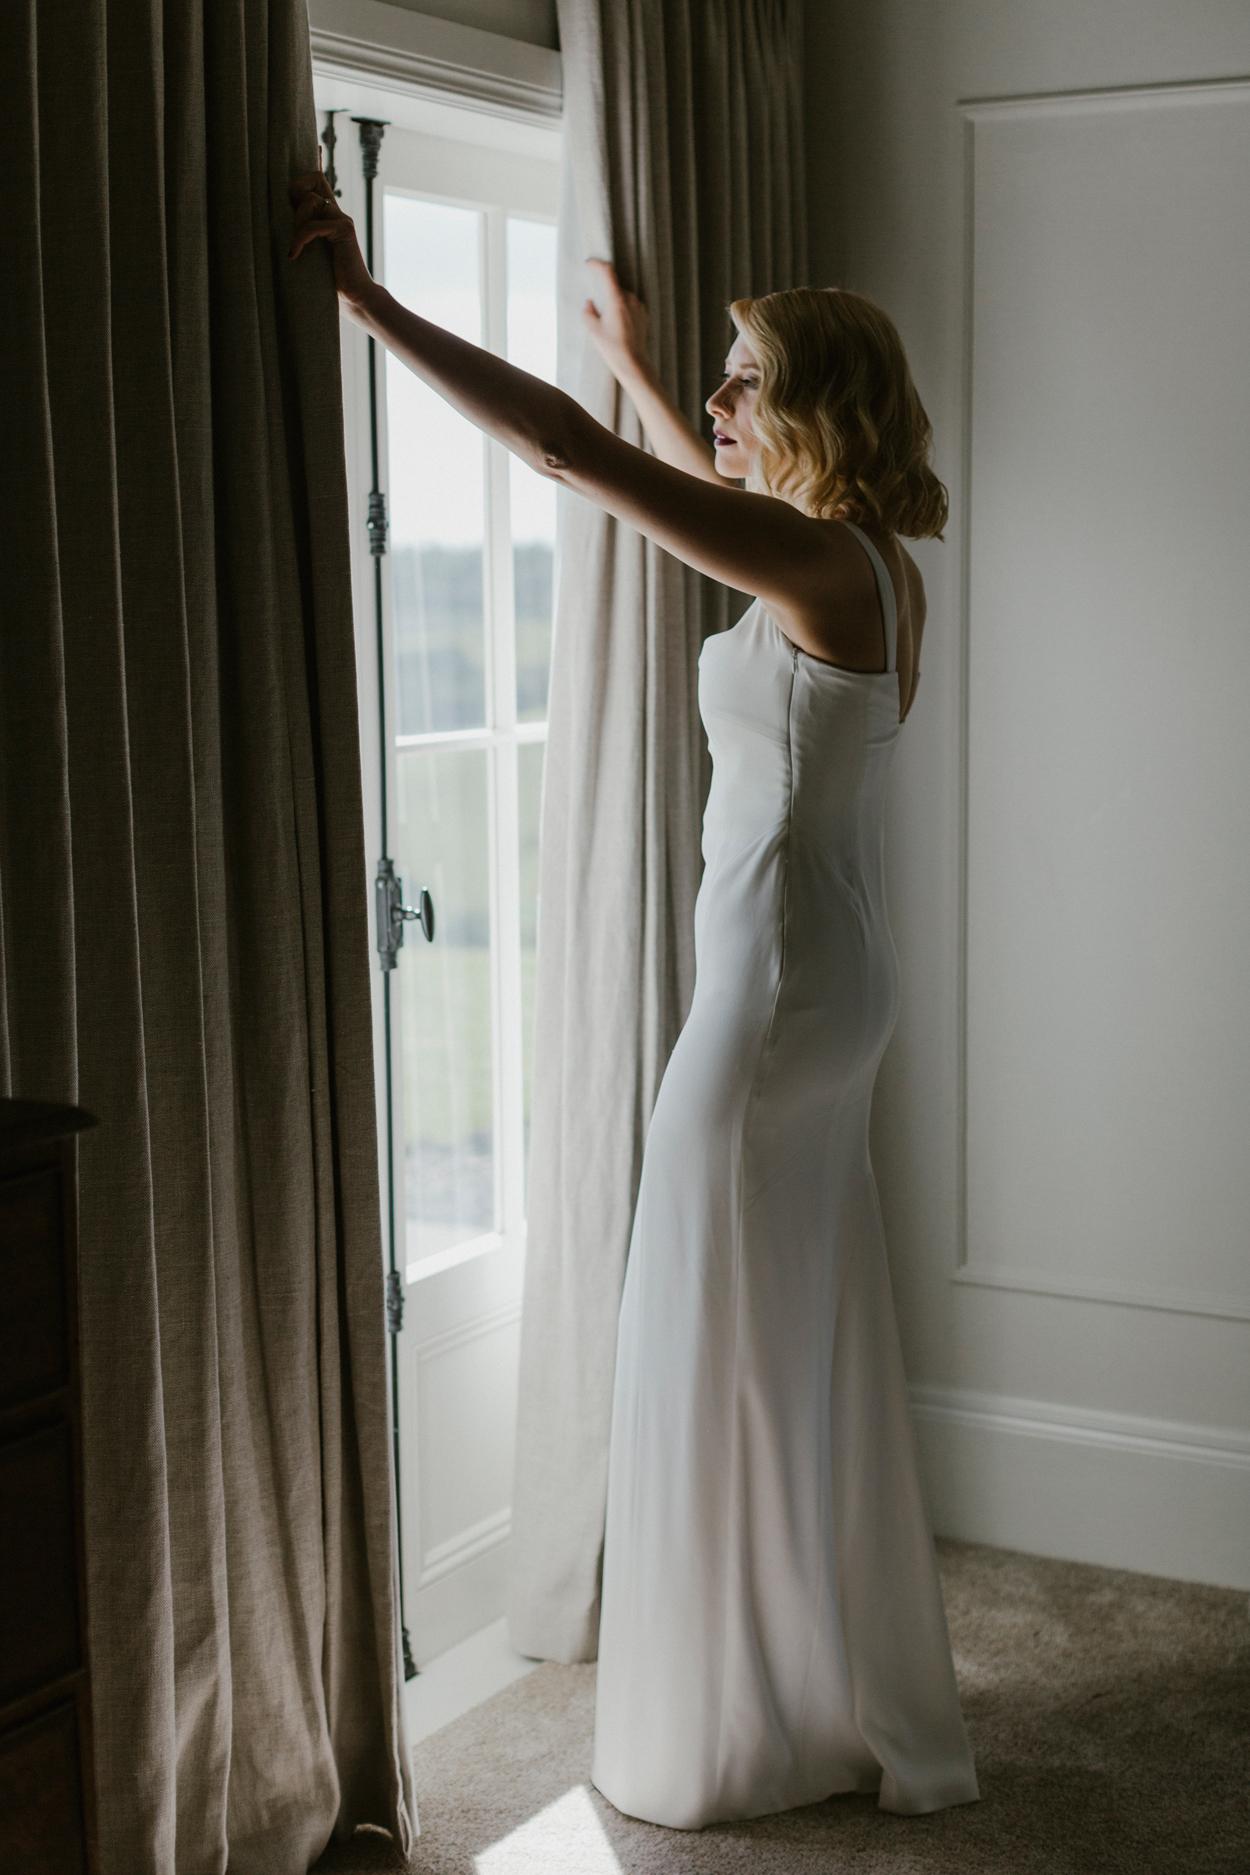 007-destination-wedding-waiheke-new-zealand.jpg